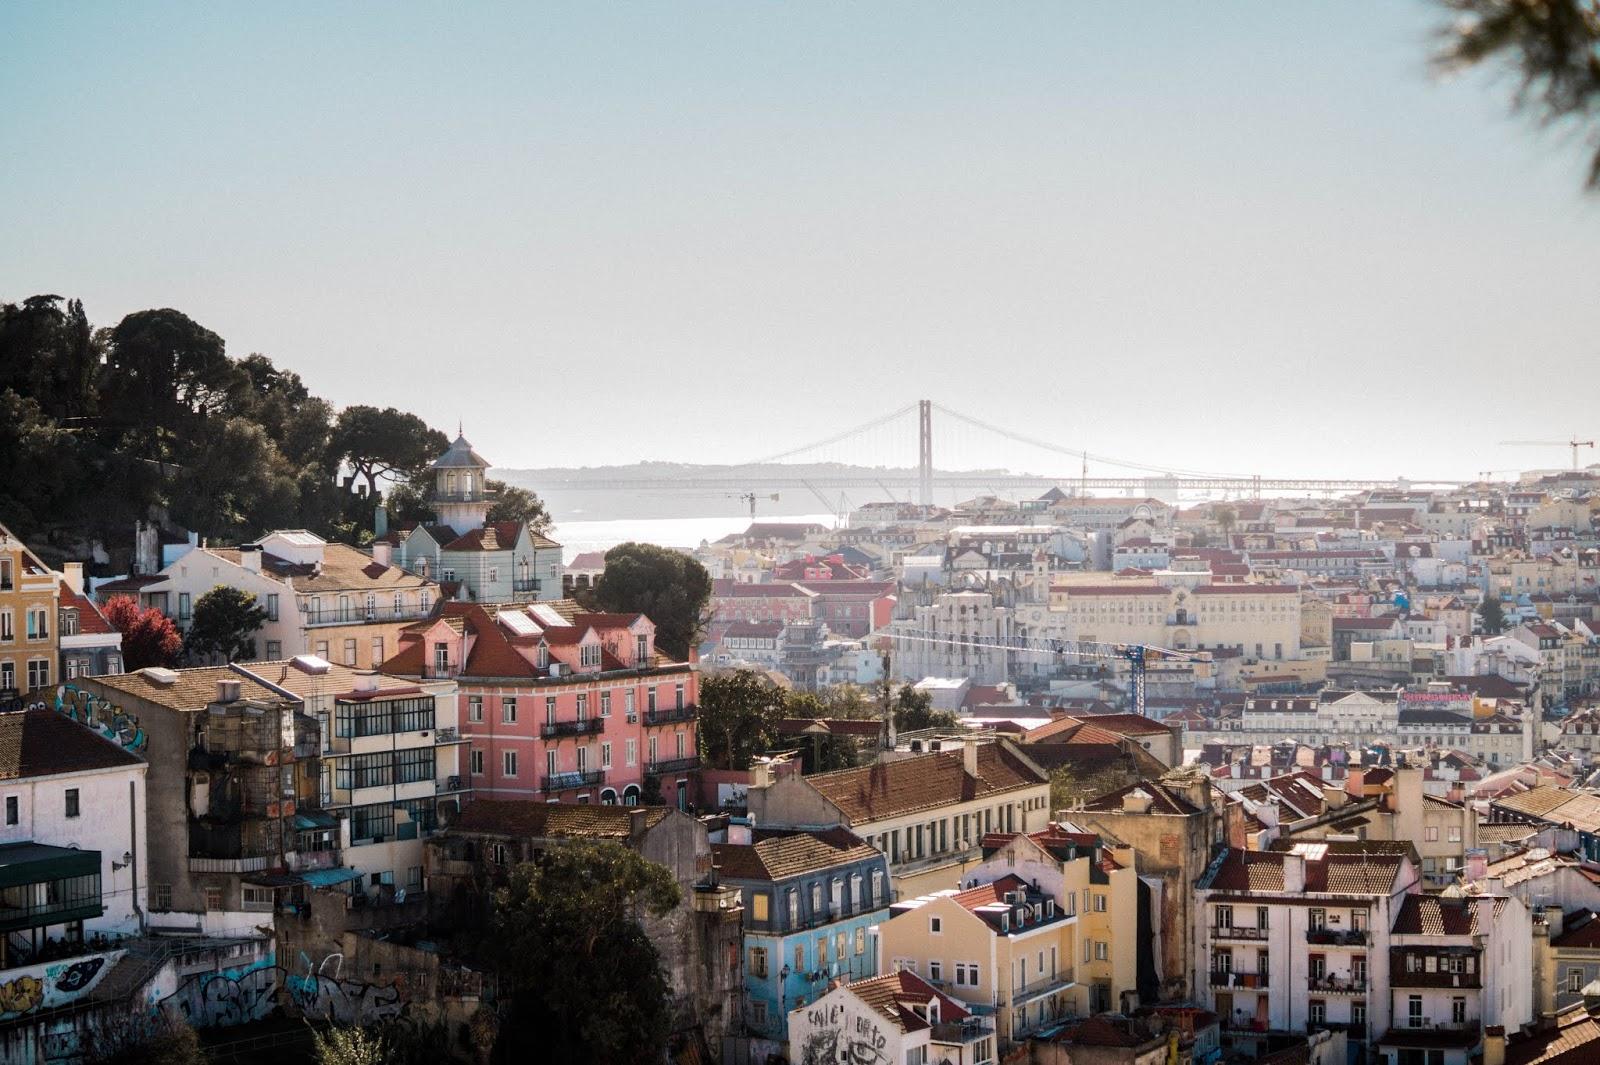 miradouro Lisbonne